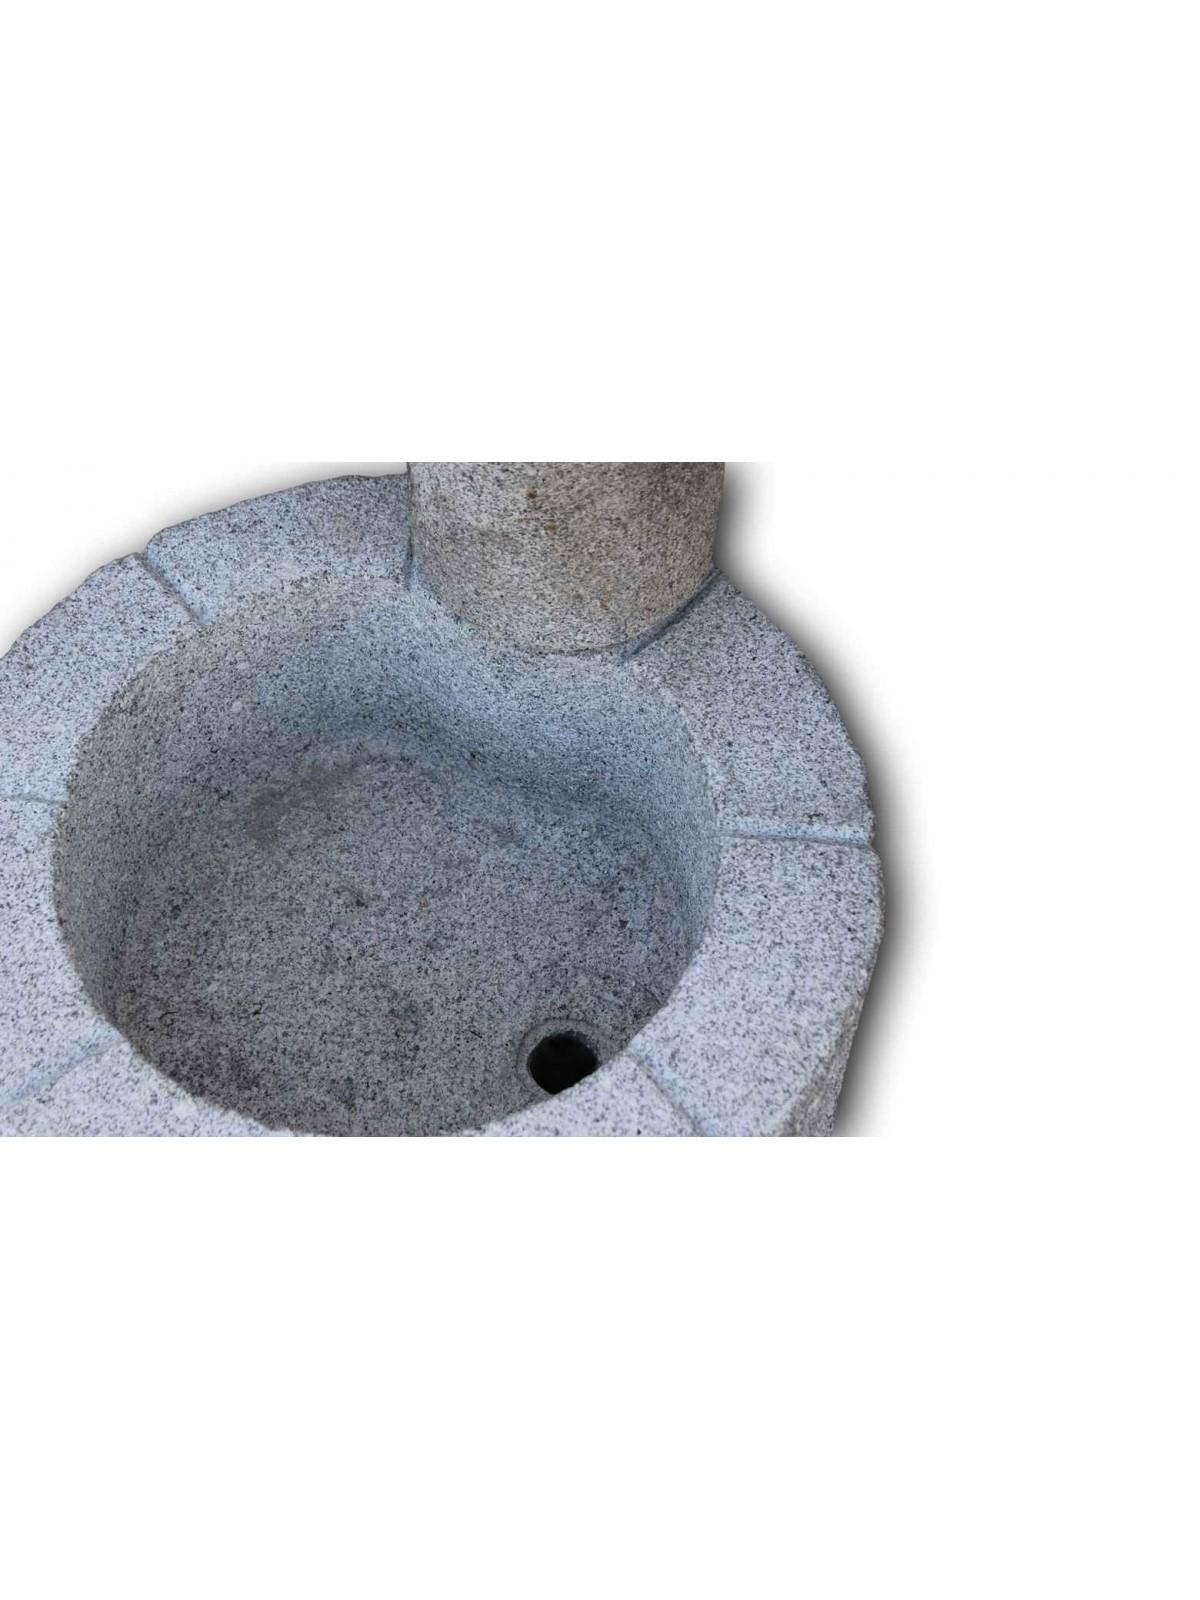 Niedriger Brunnen aus grauem Granit Nr.2